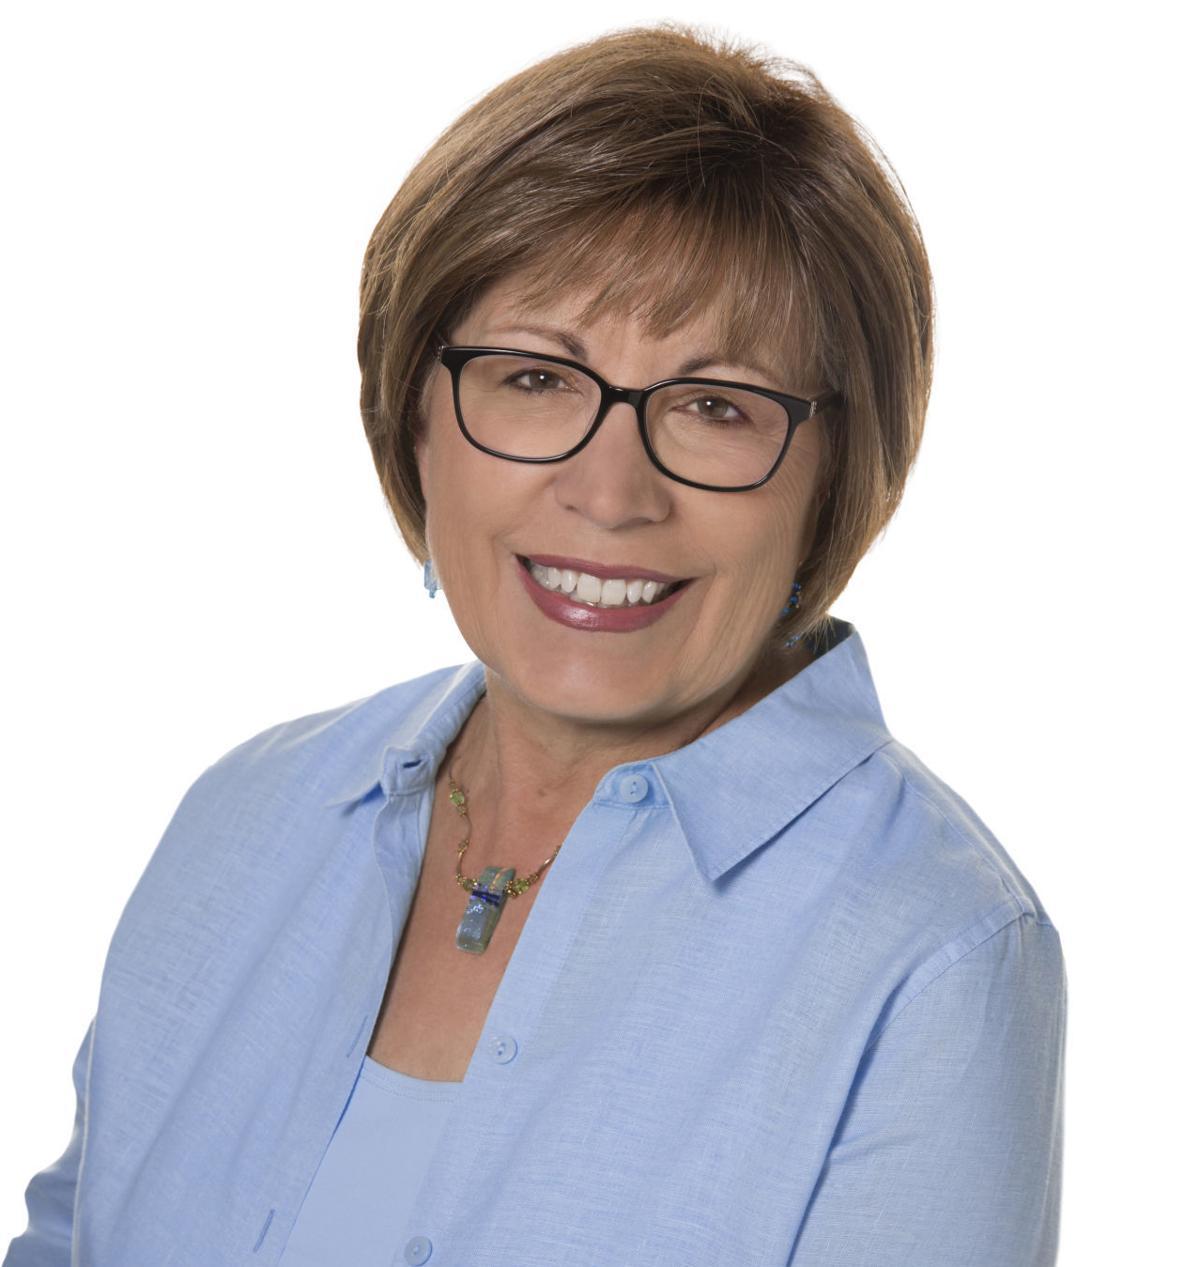 Pam Purinton, Ward 4 candidate